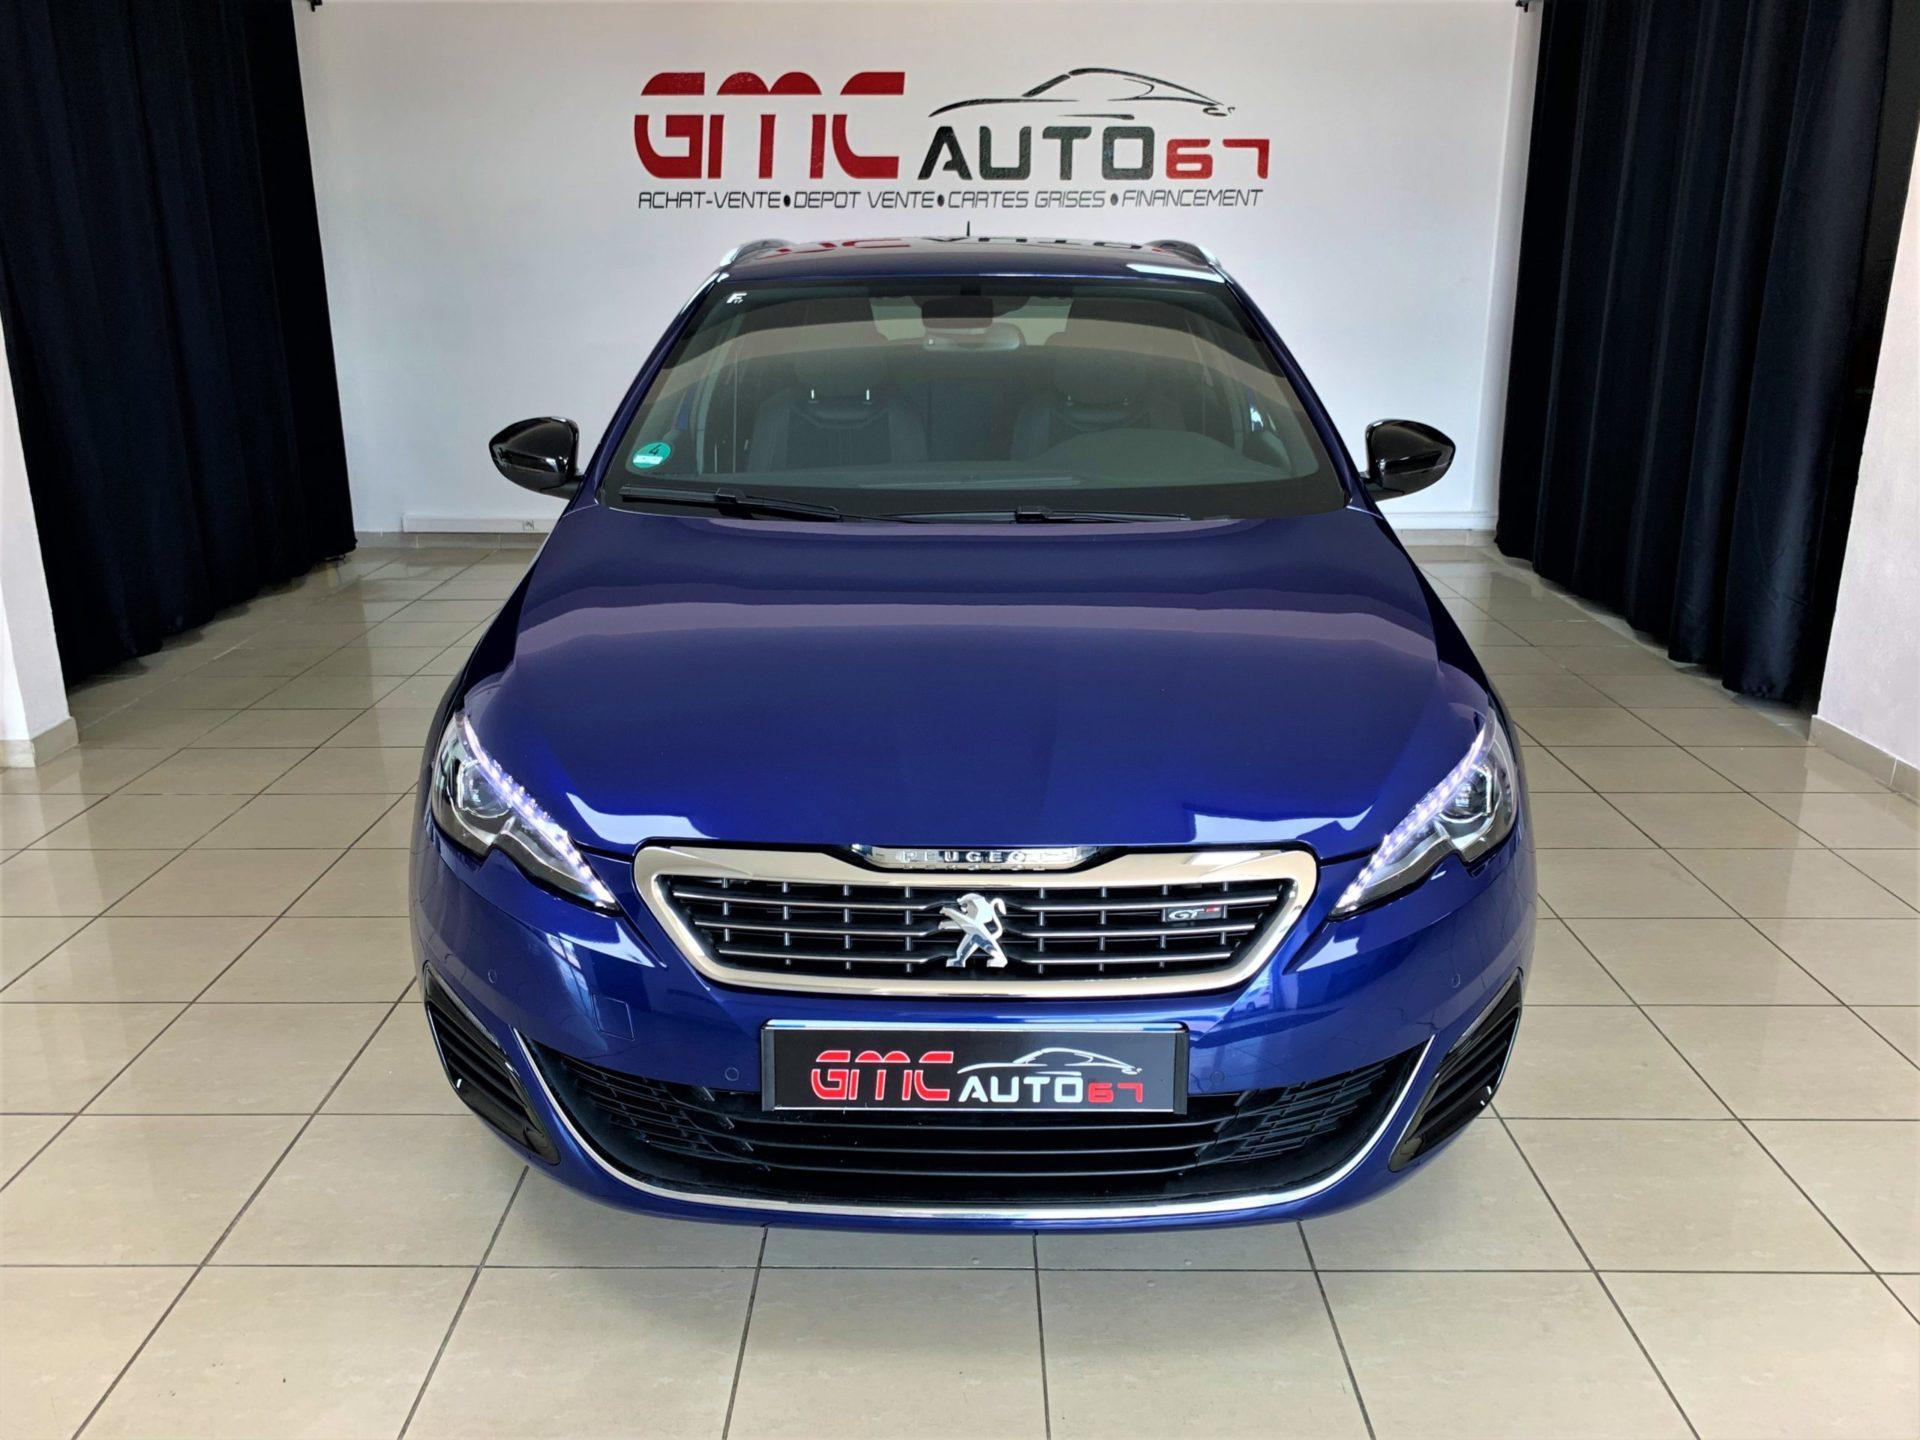 Peugeot 308 SW 2.0 BlueHDi 180ch S&S EAT6 GT break - GMC AUTO 67